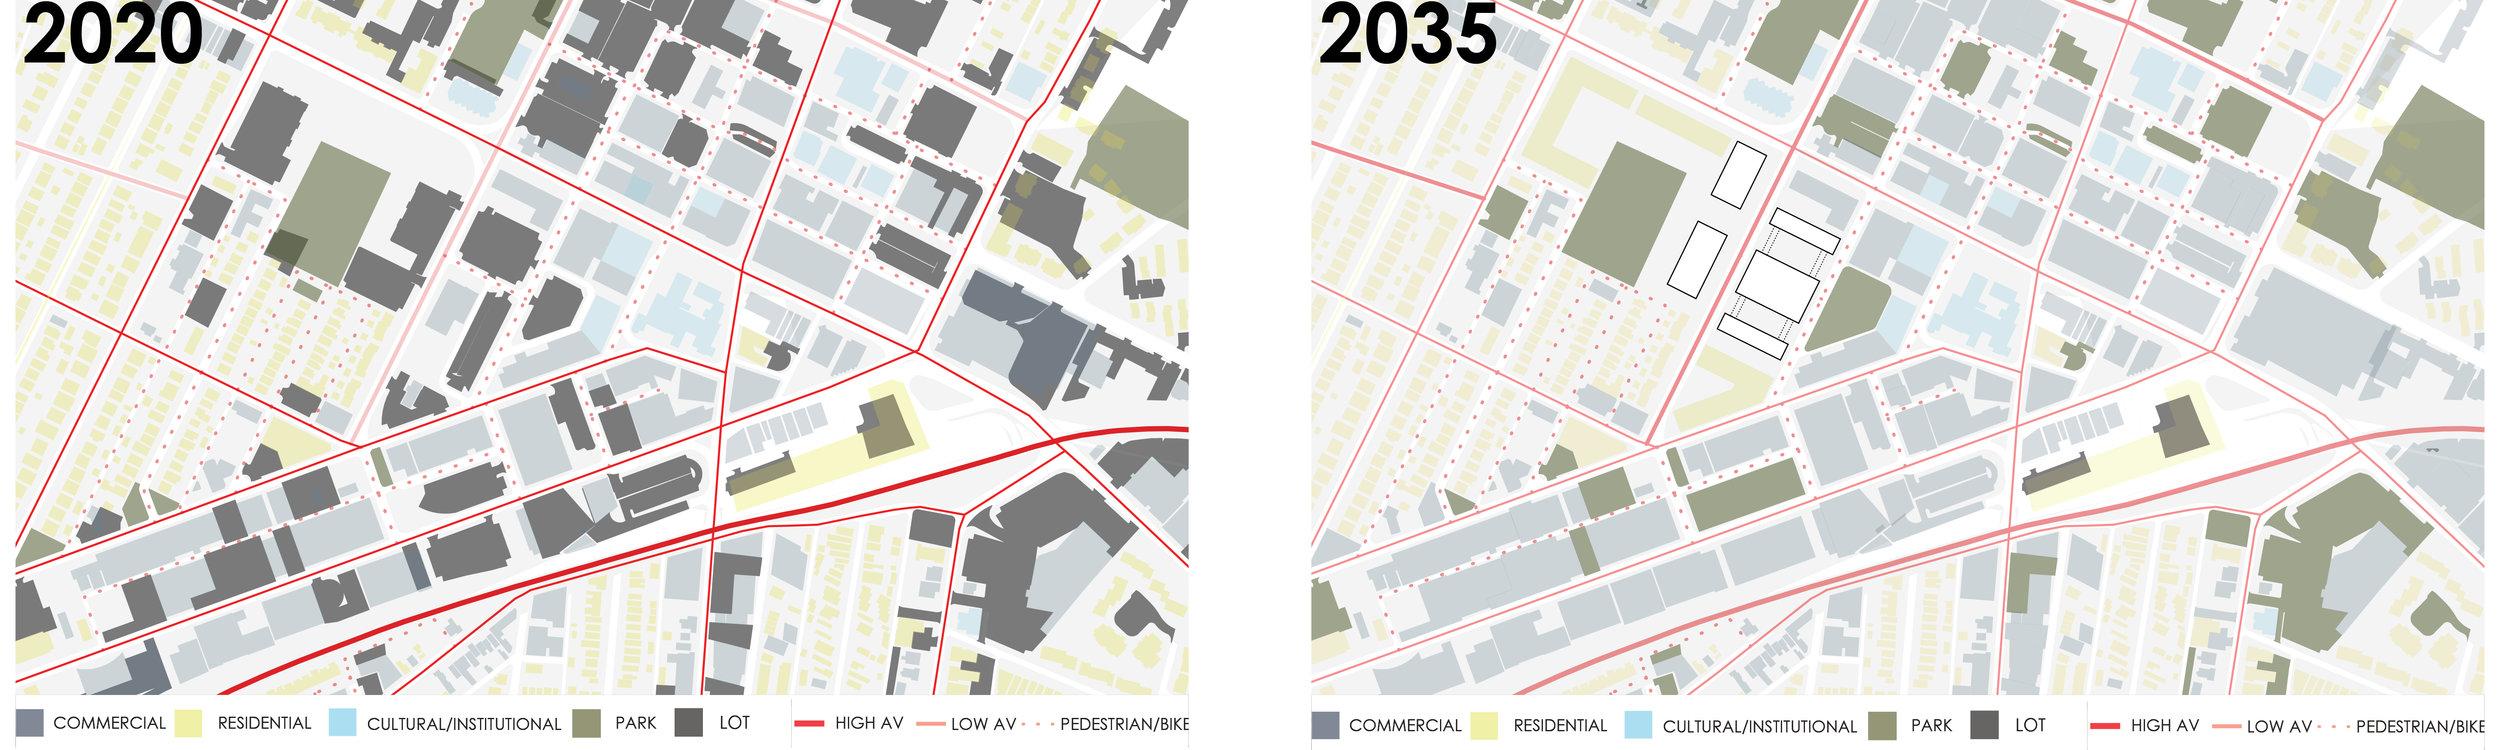 big site plans.jpg